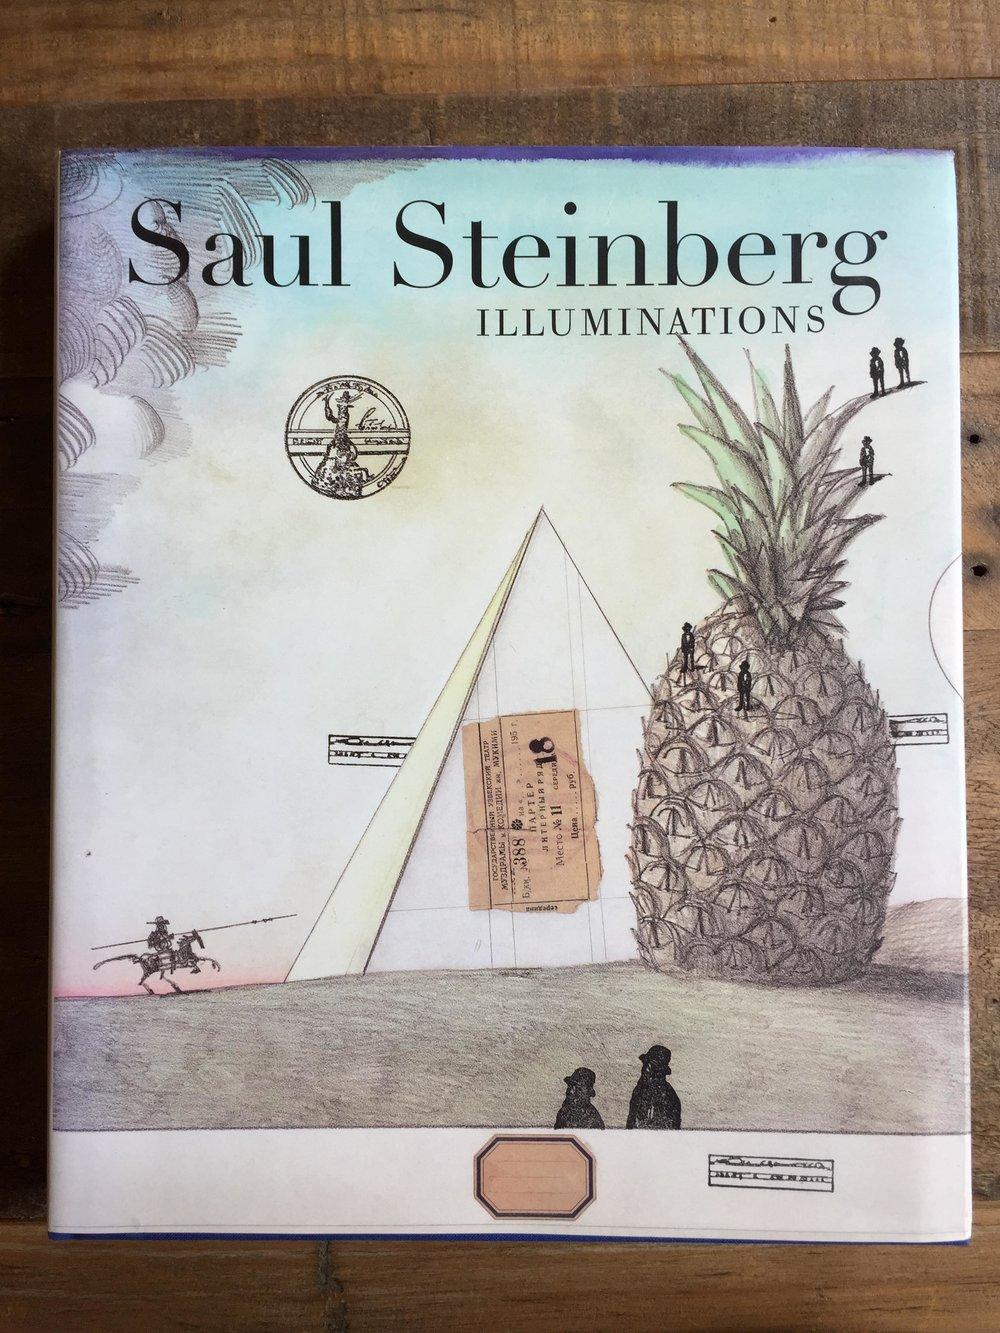 Scriberia Top Five Books for Creative Block Saul Sternberg Illuminations